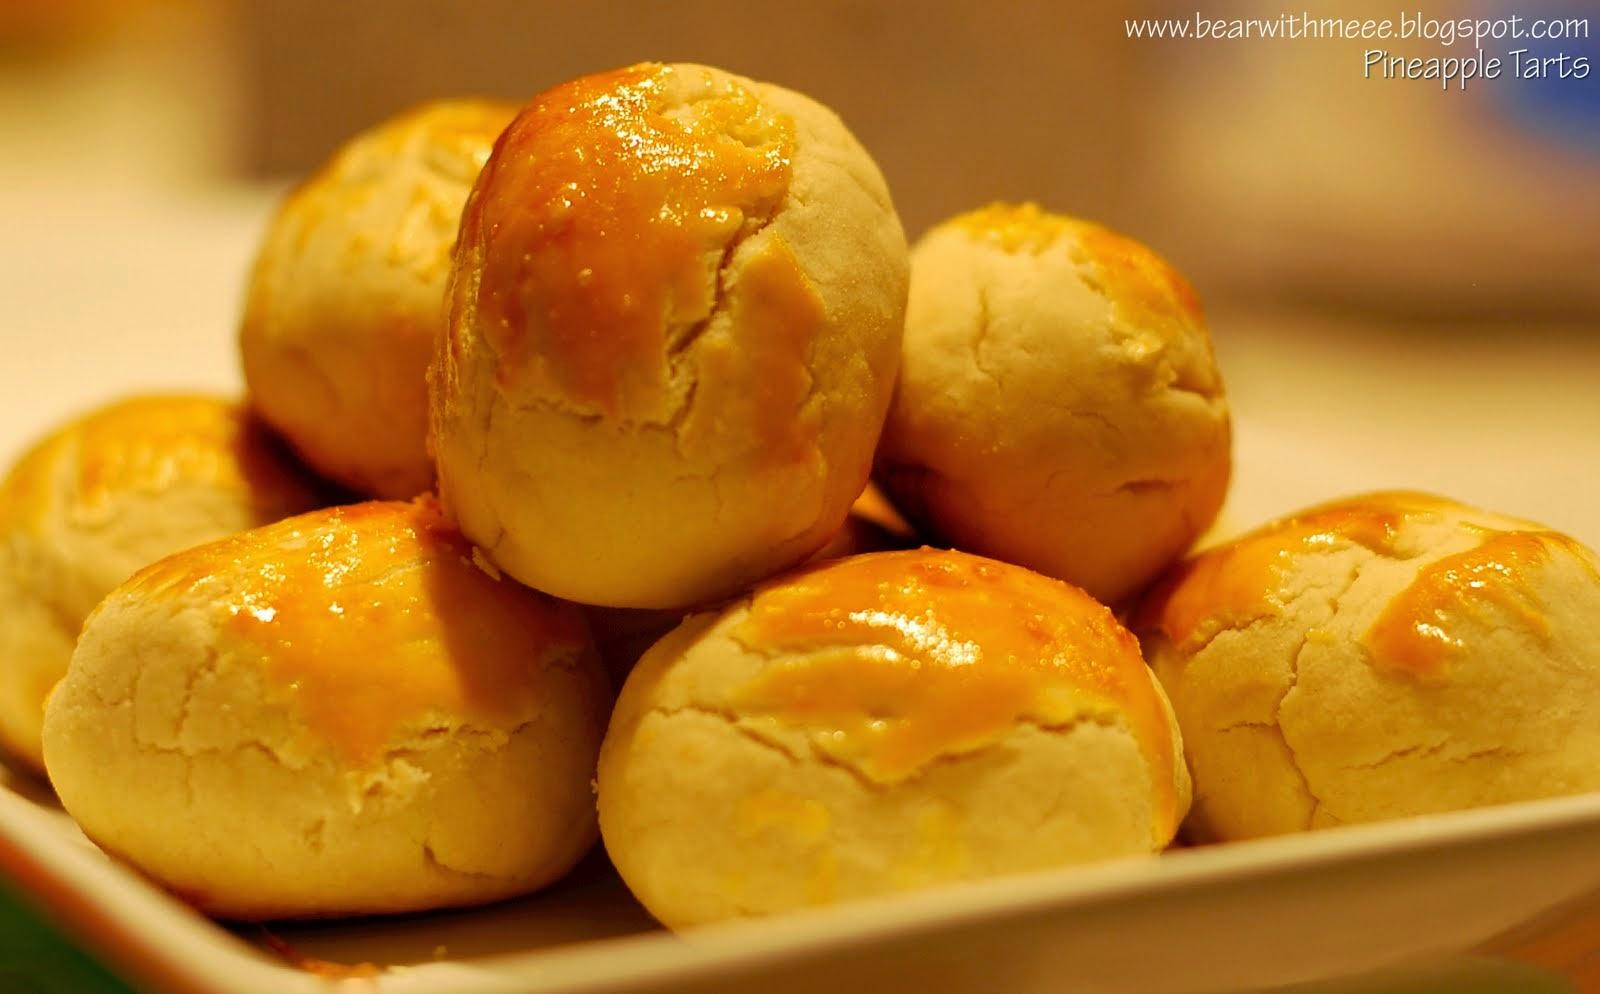 Resep Cake Tart Ncc: Resep Kue Kering Nastar Nanas Spesial Keju Empuk, Enak Dan